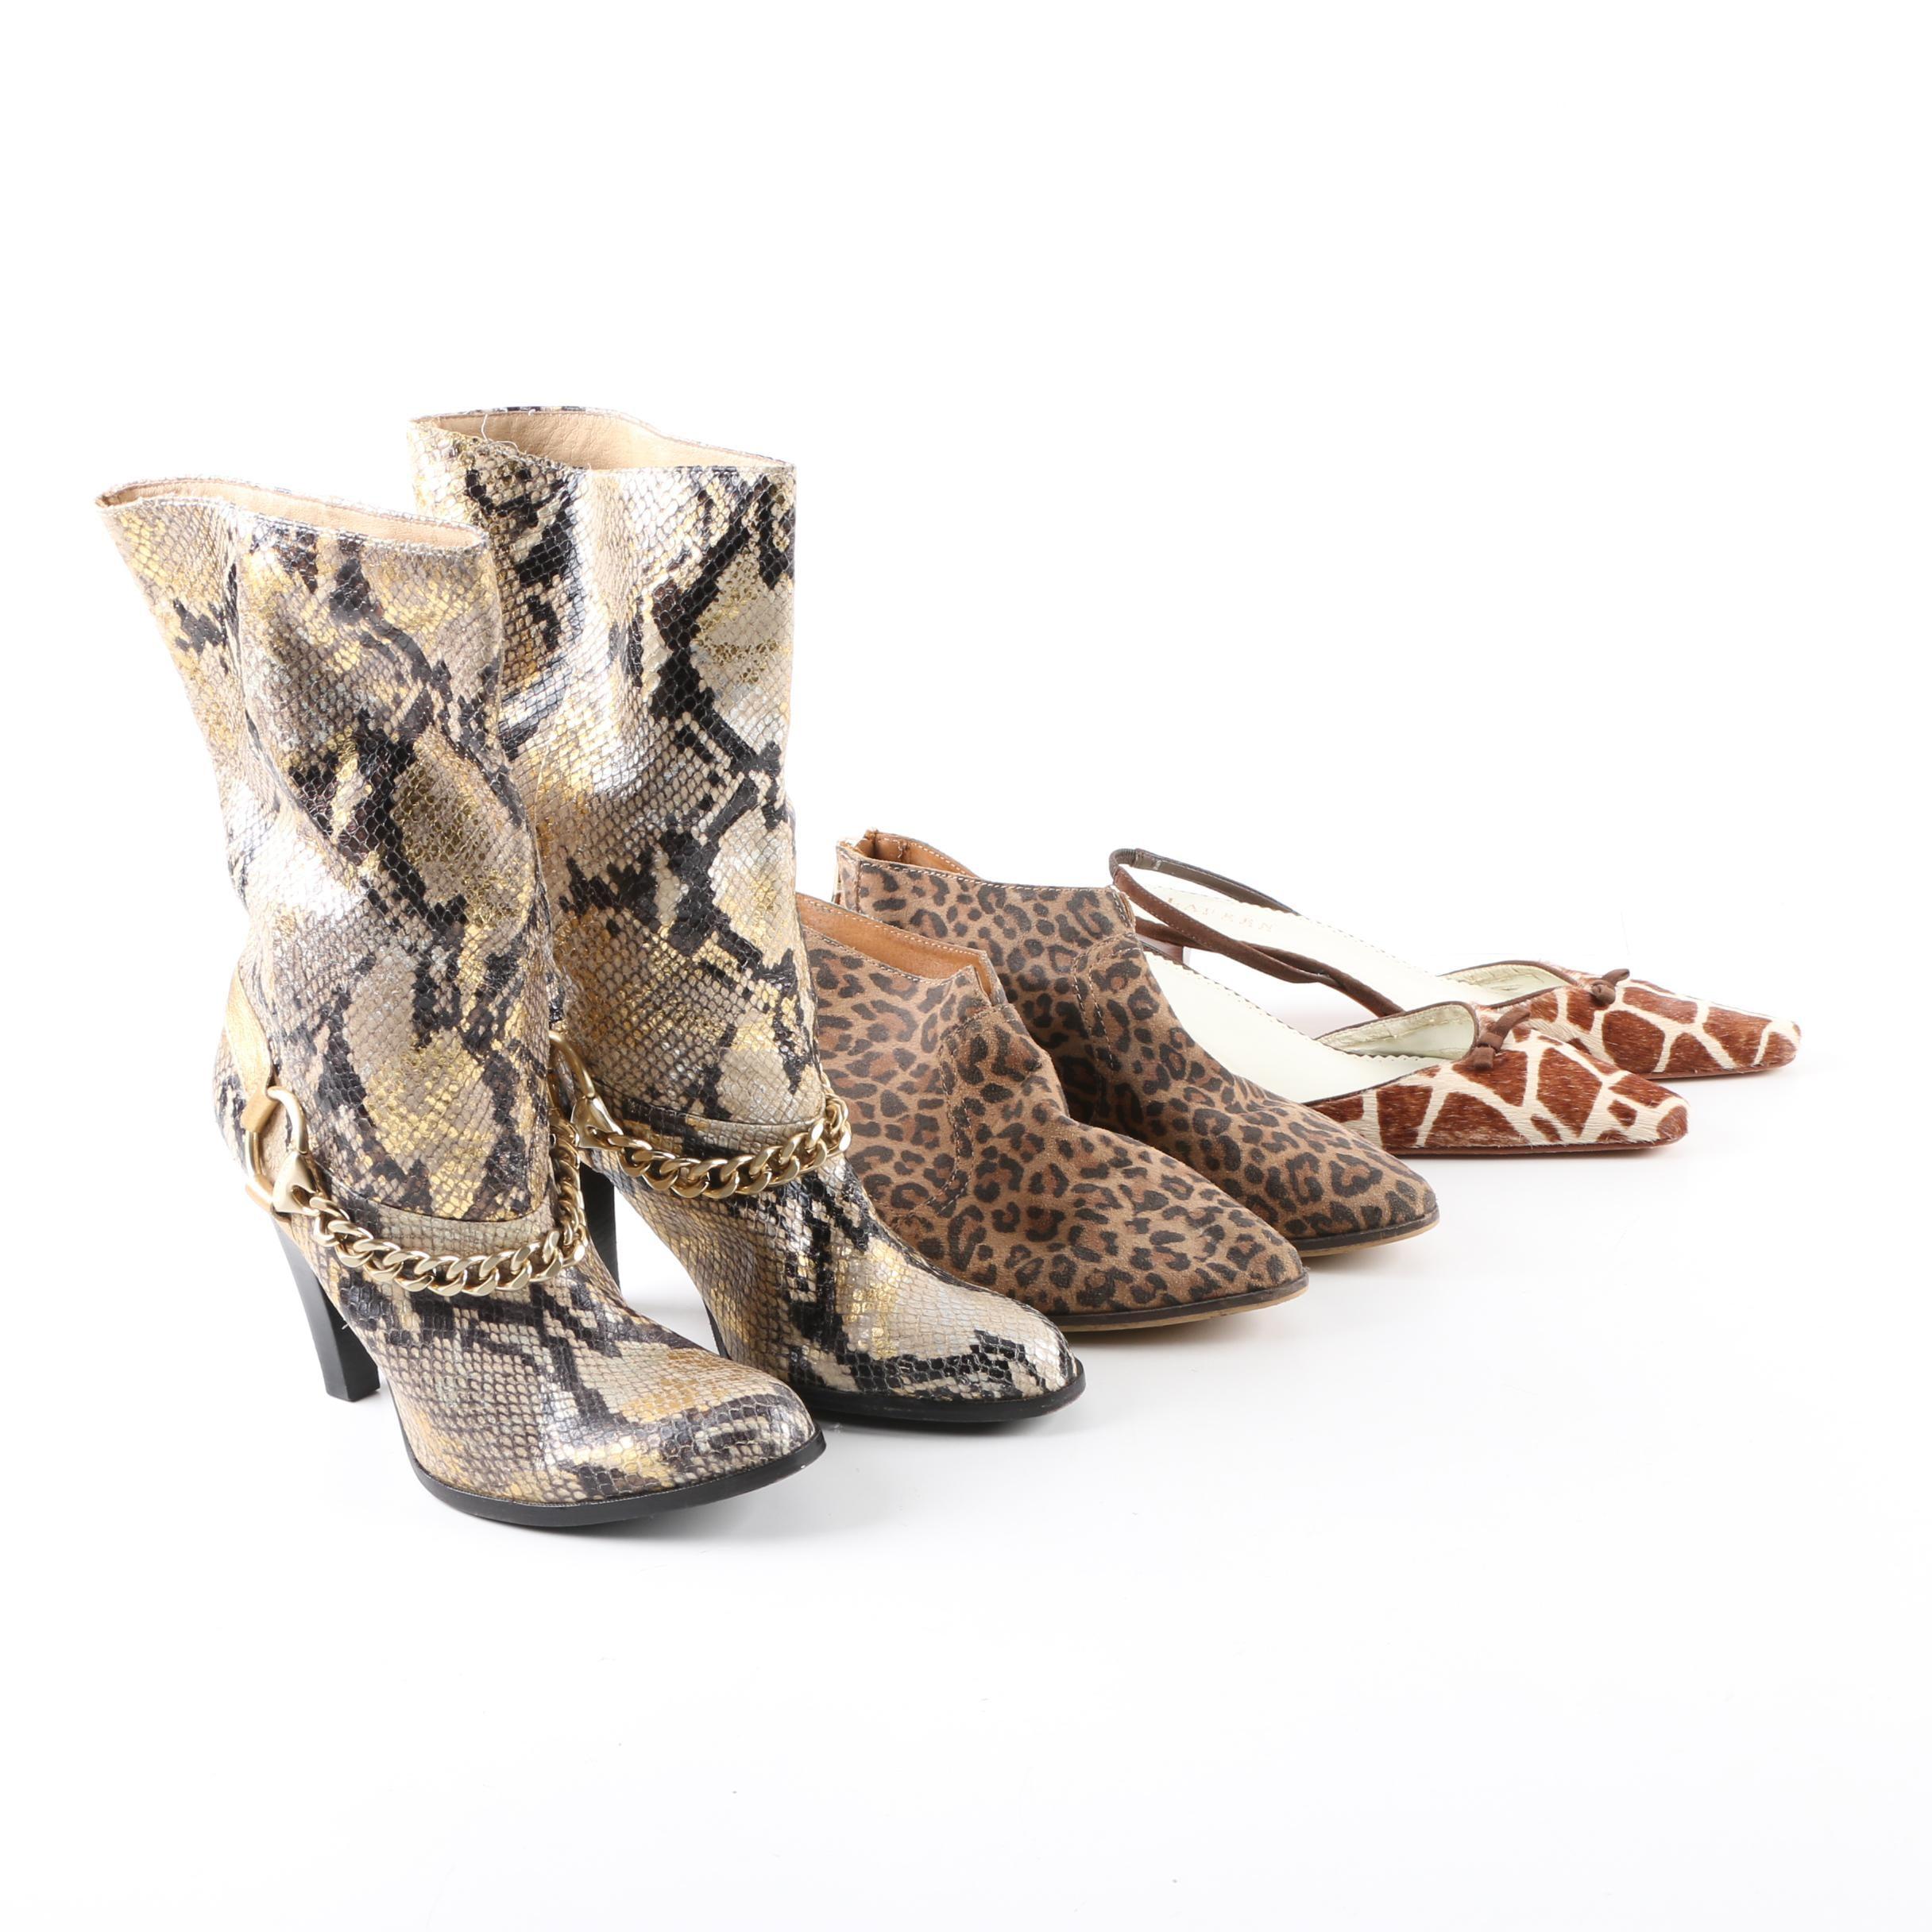 Women's Patterned Shoes by MICHAEL Michael Kors, Aldo and LAUREN Ralph Lauren